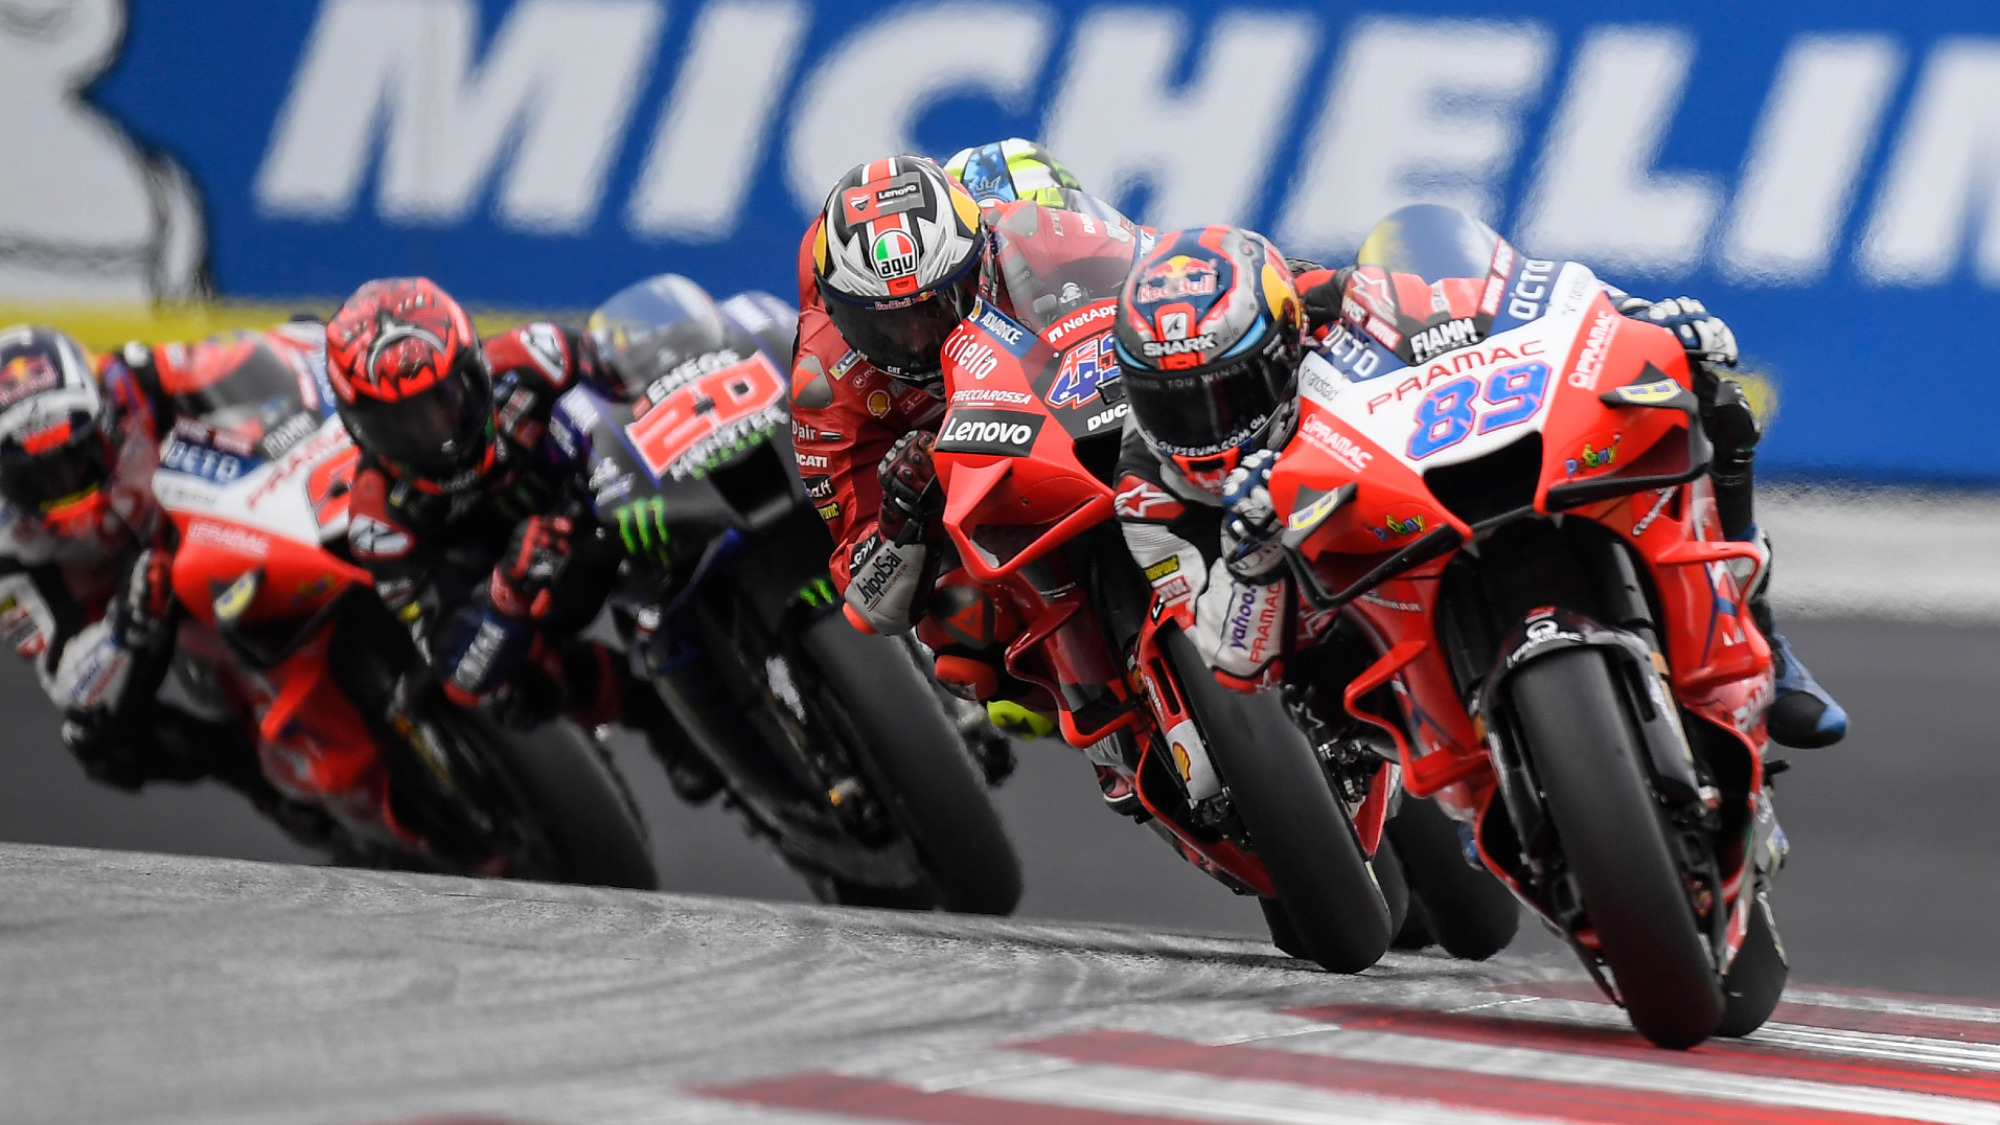 How to watch the MotoGP 2021 Grand Prix of Austria - Motor Sport